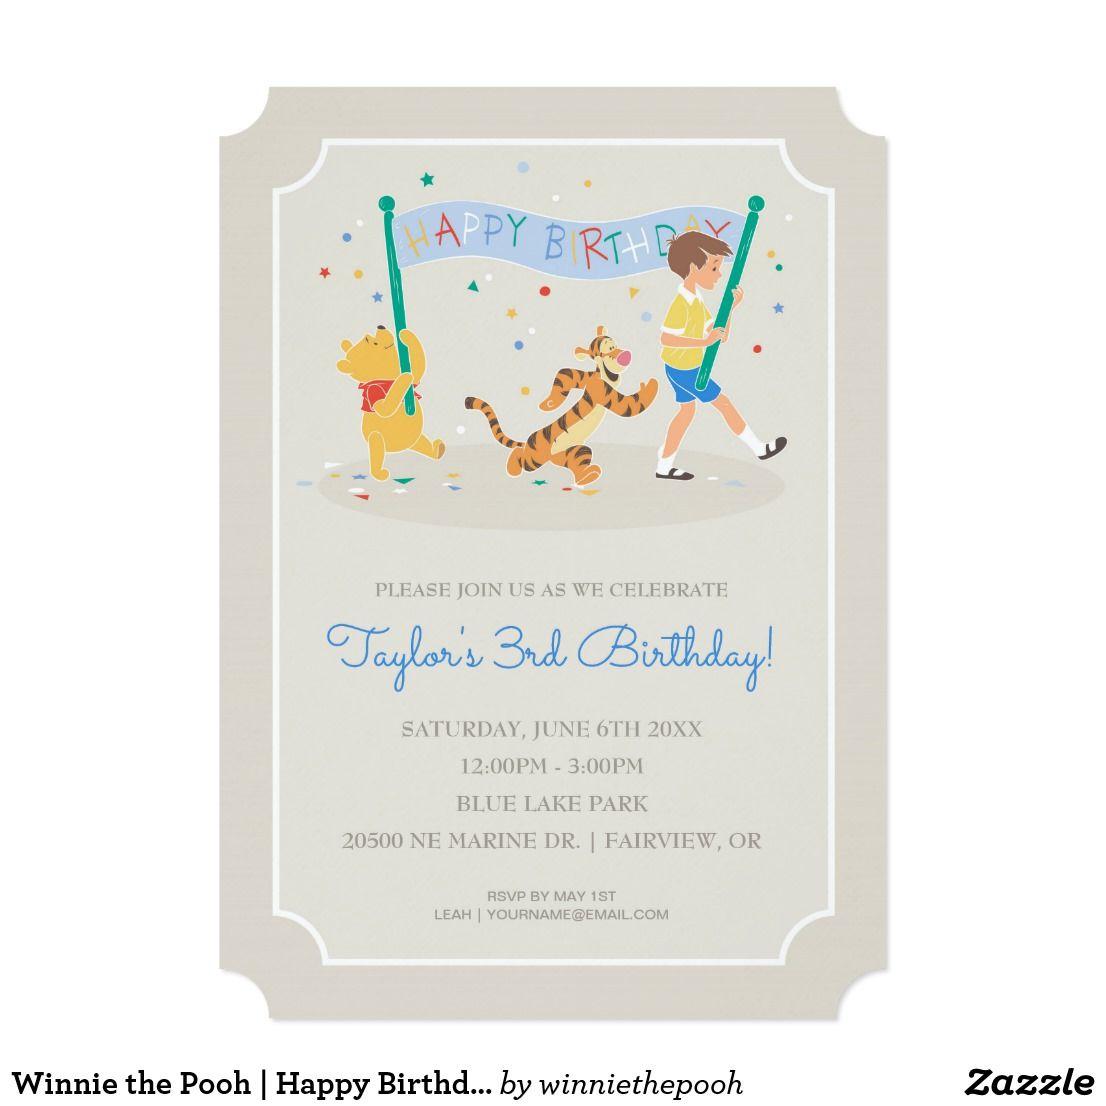 Winnie the Pooh | Happy Birthday Card | Disney birthday and Birthdays